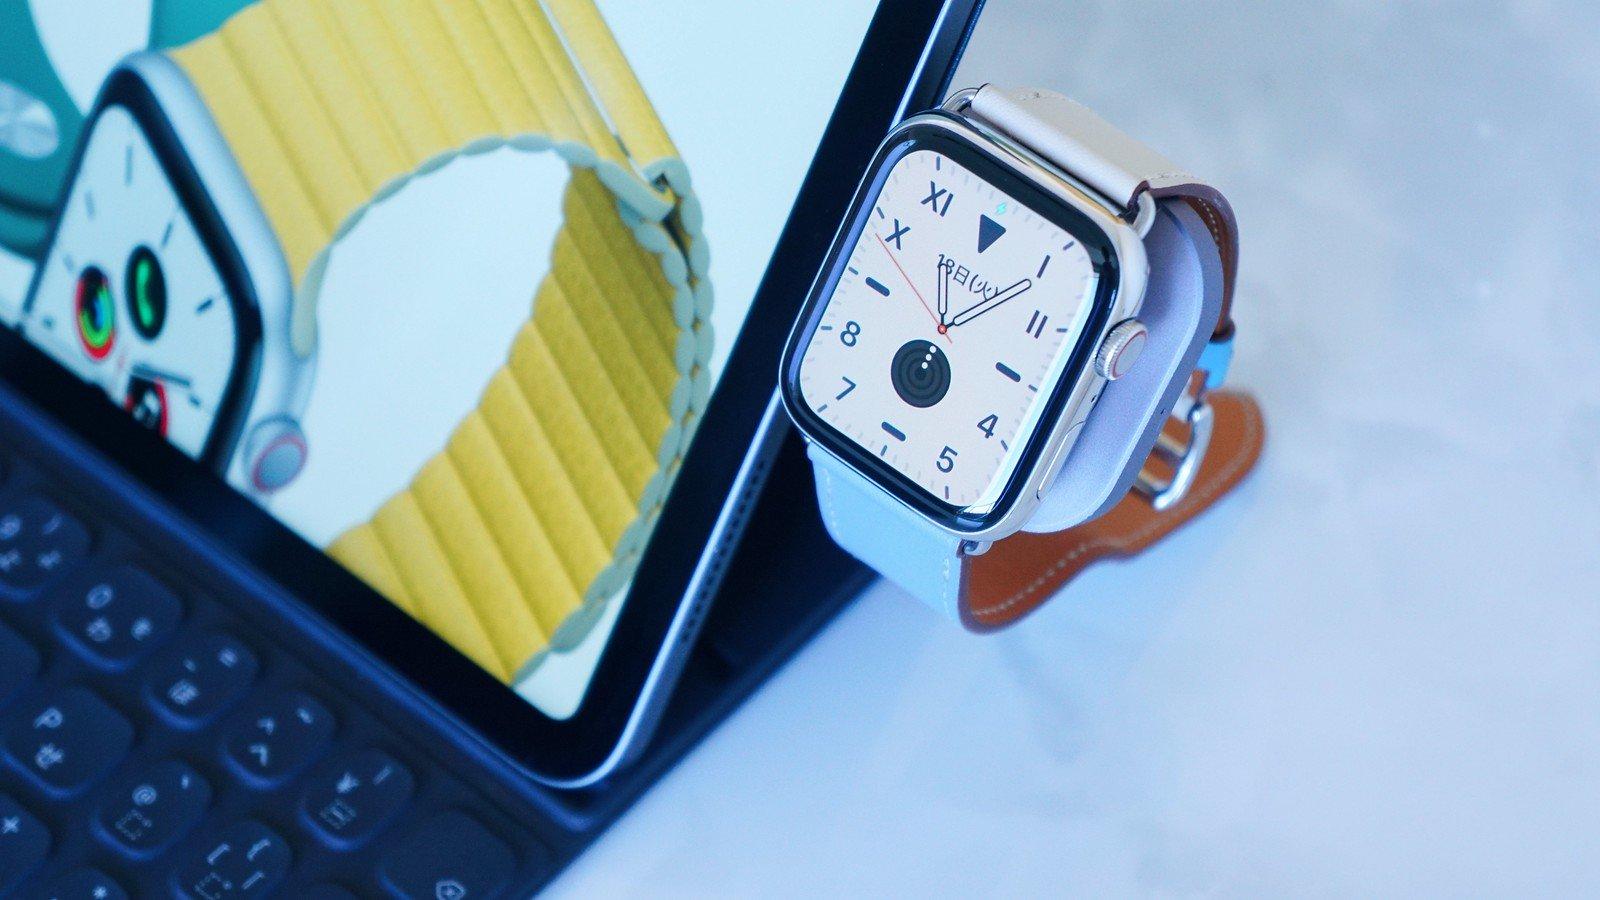 Apple Watch Series 6、急速充電に対応?新色ブルー追加か